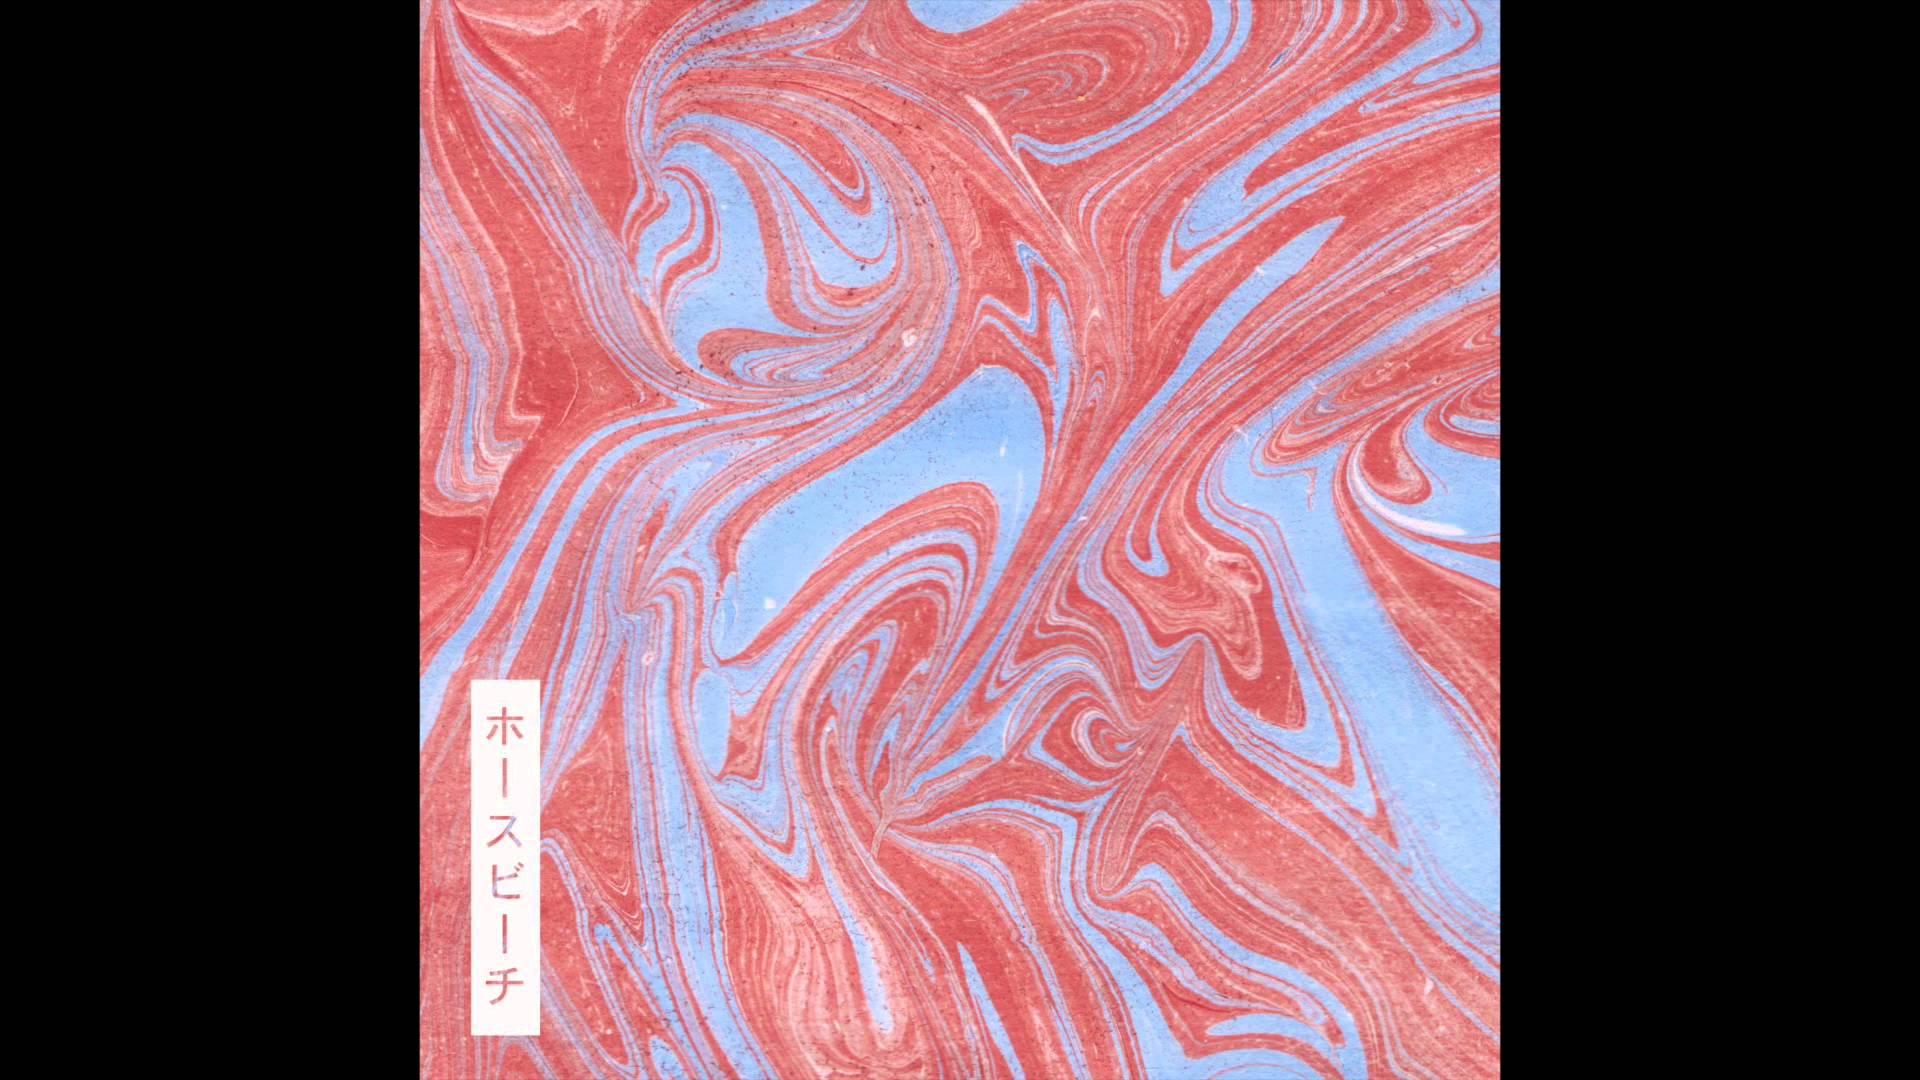 Album Review: II // Horsebeach